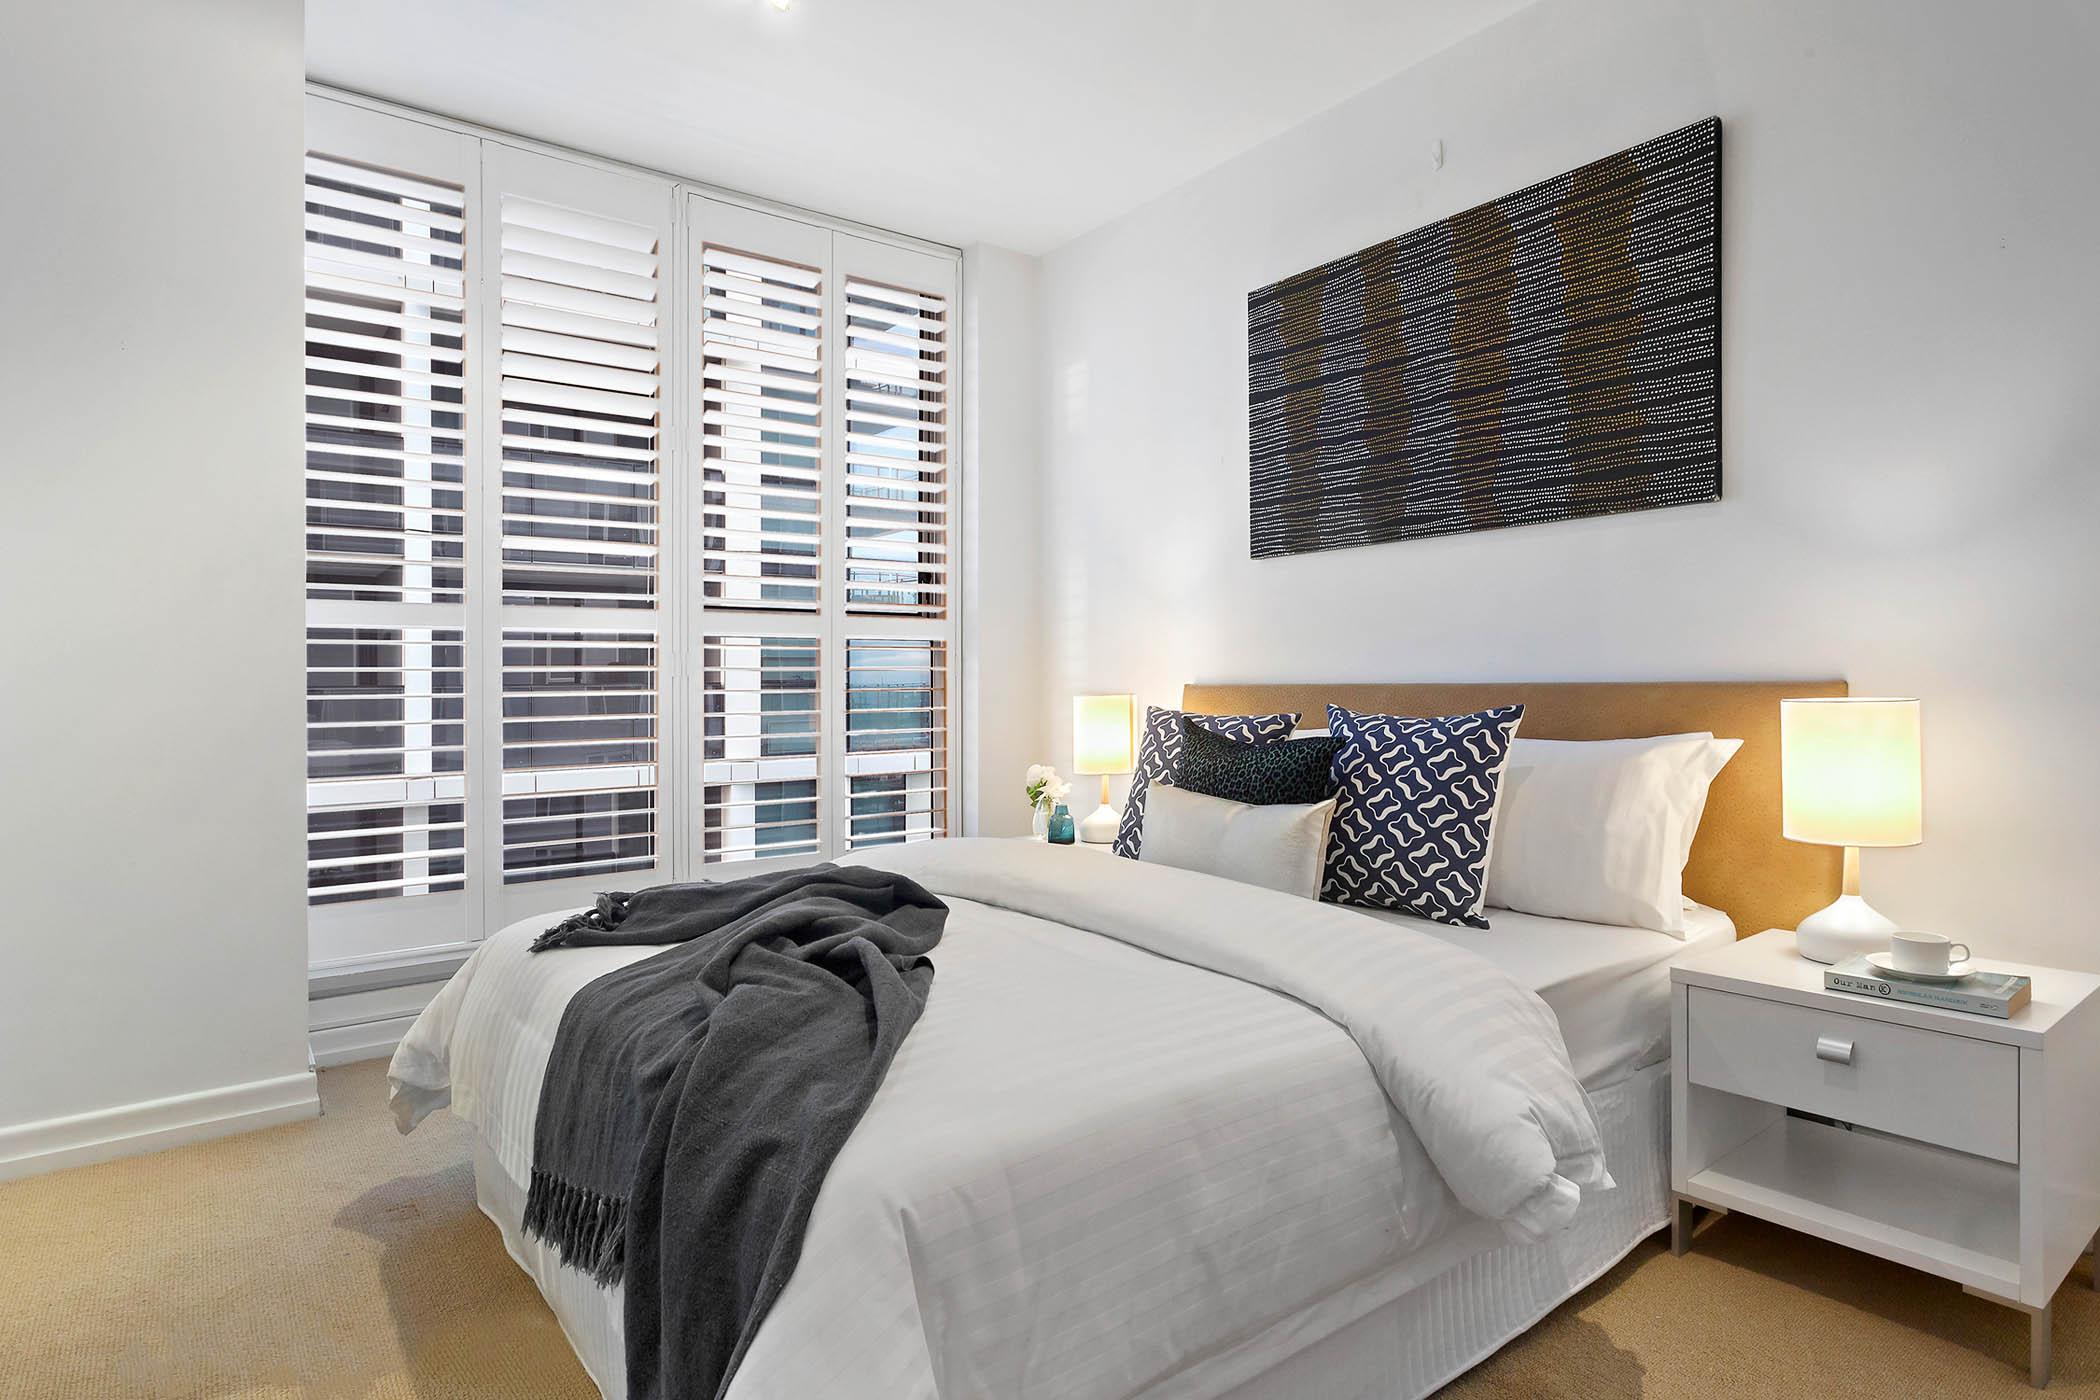 1804-31-spring-street-melbourne-student-accommodation-Melbourne-Bedroom-2-Unilodgers